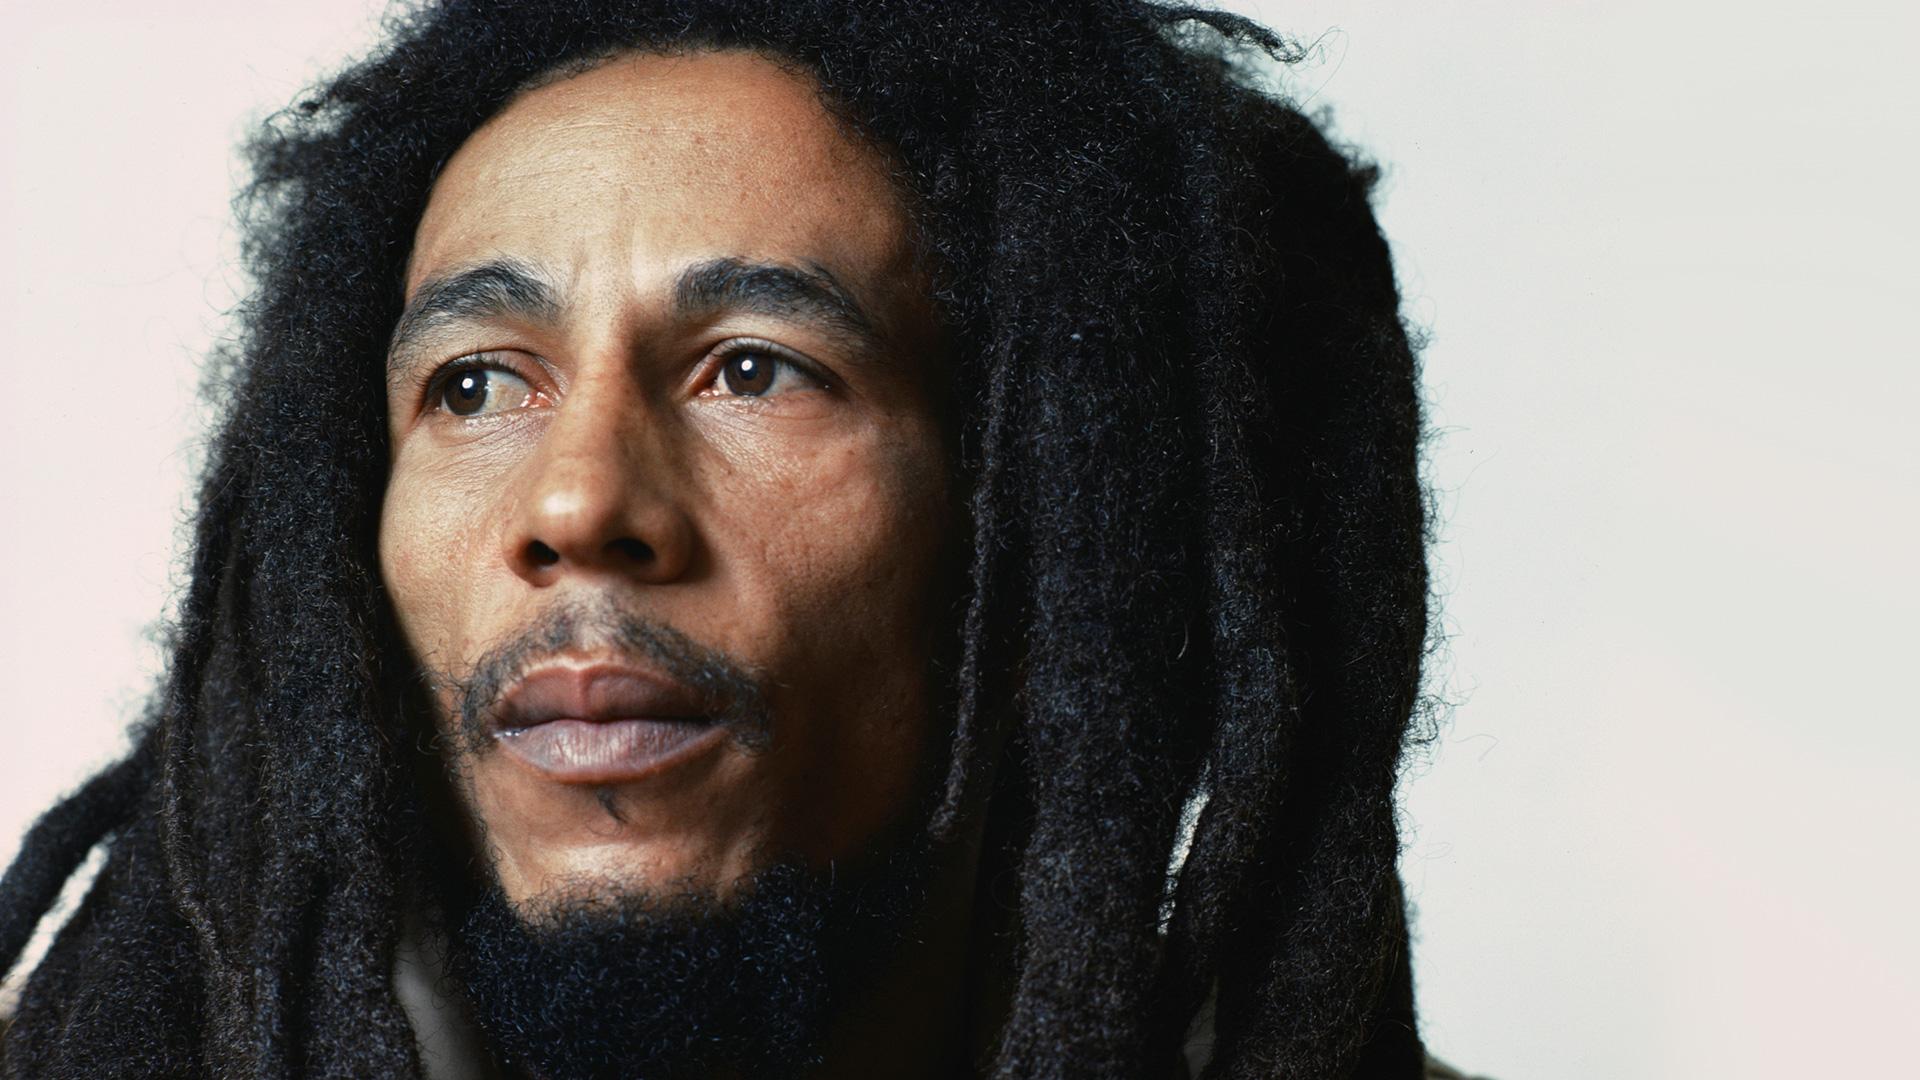 Bob Marley - 1920x1080